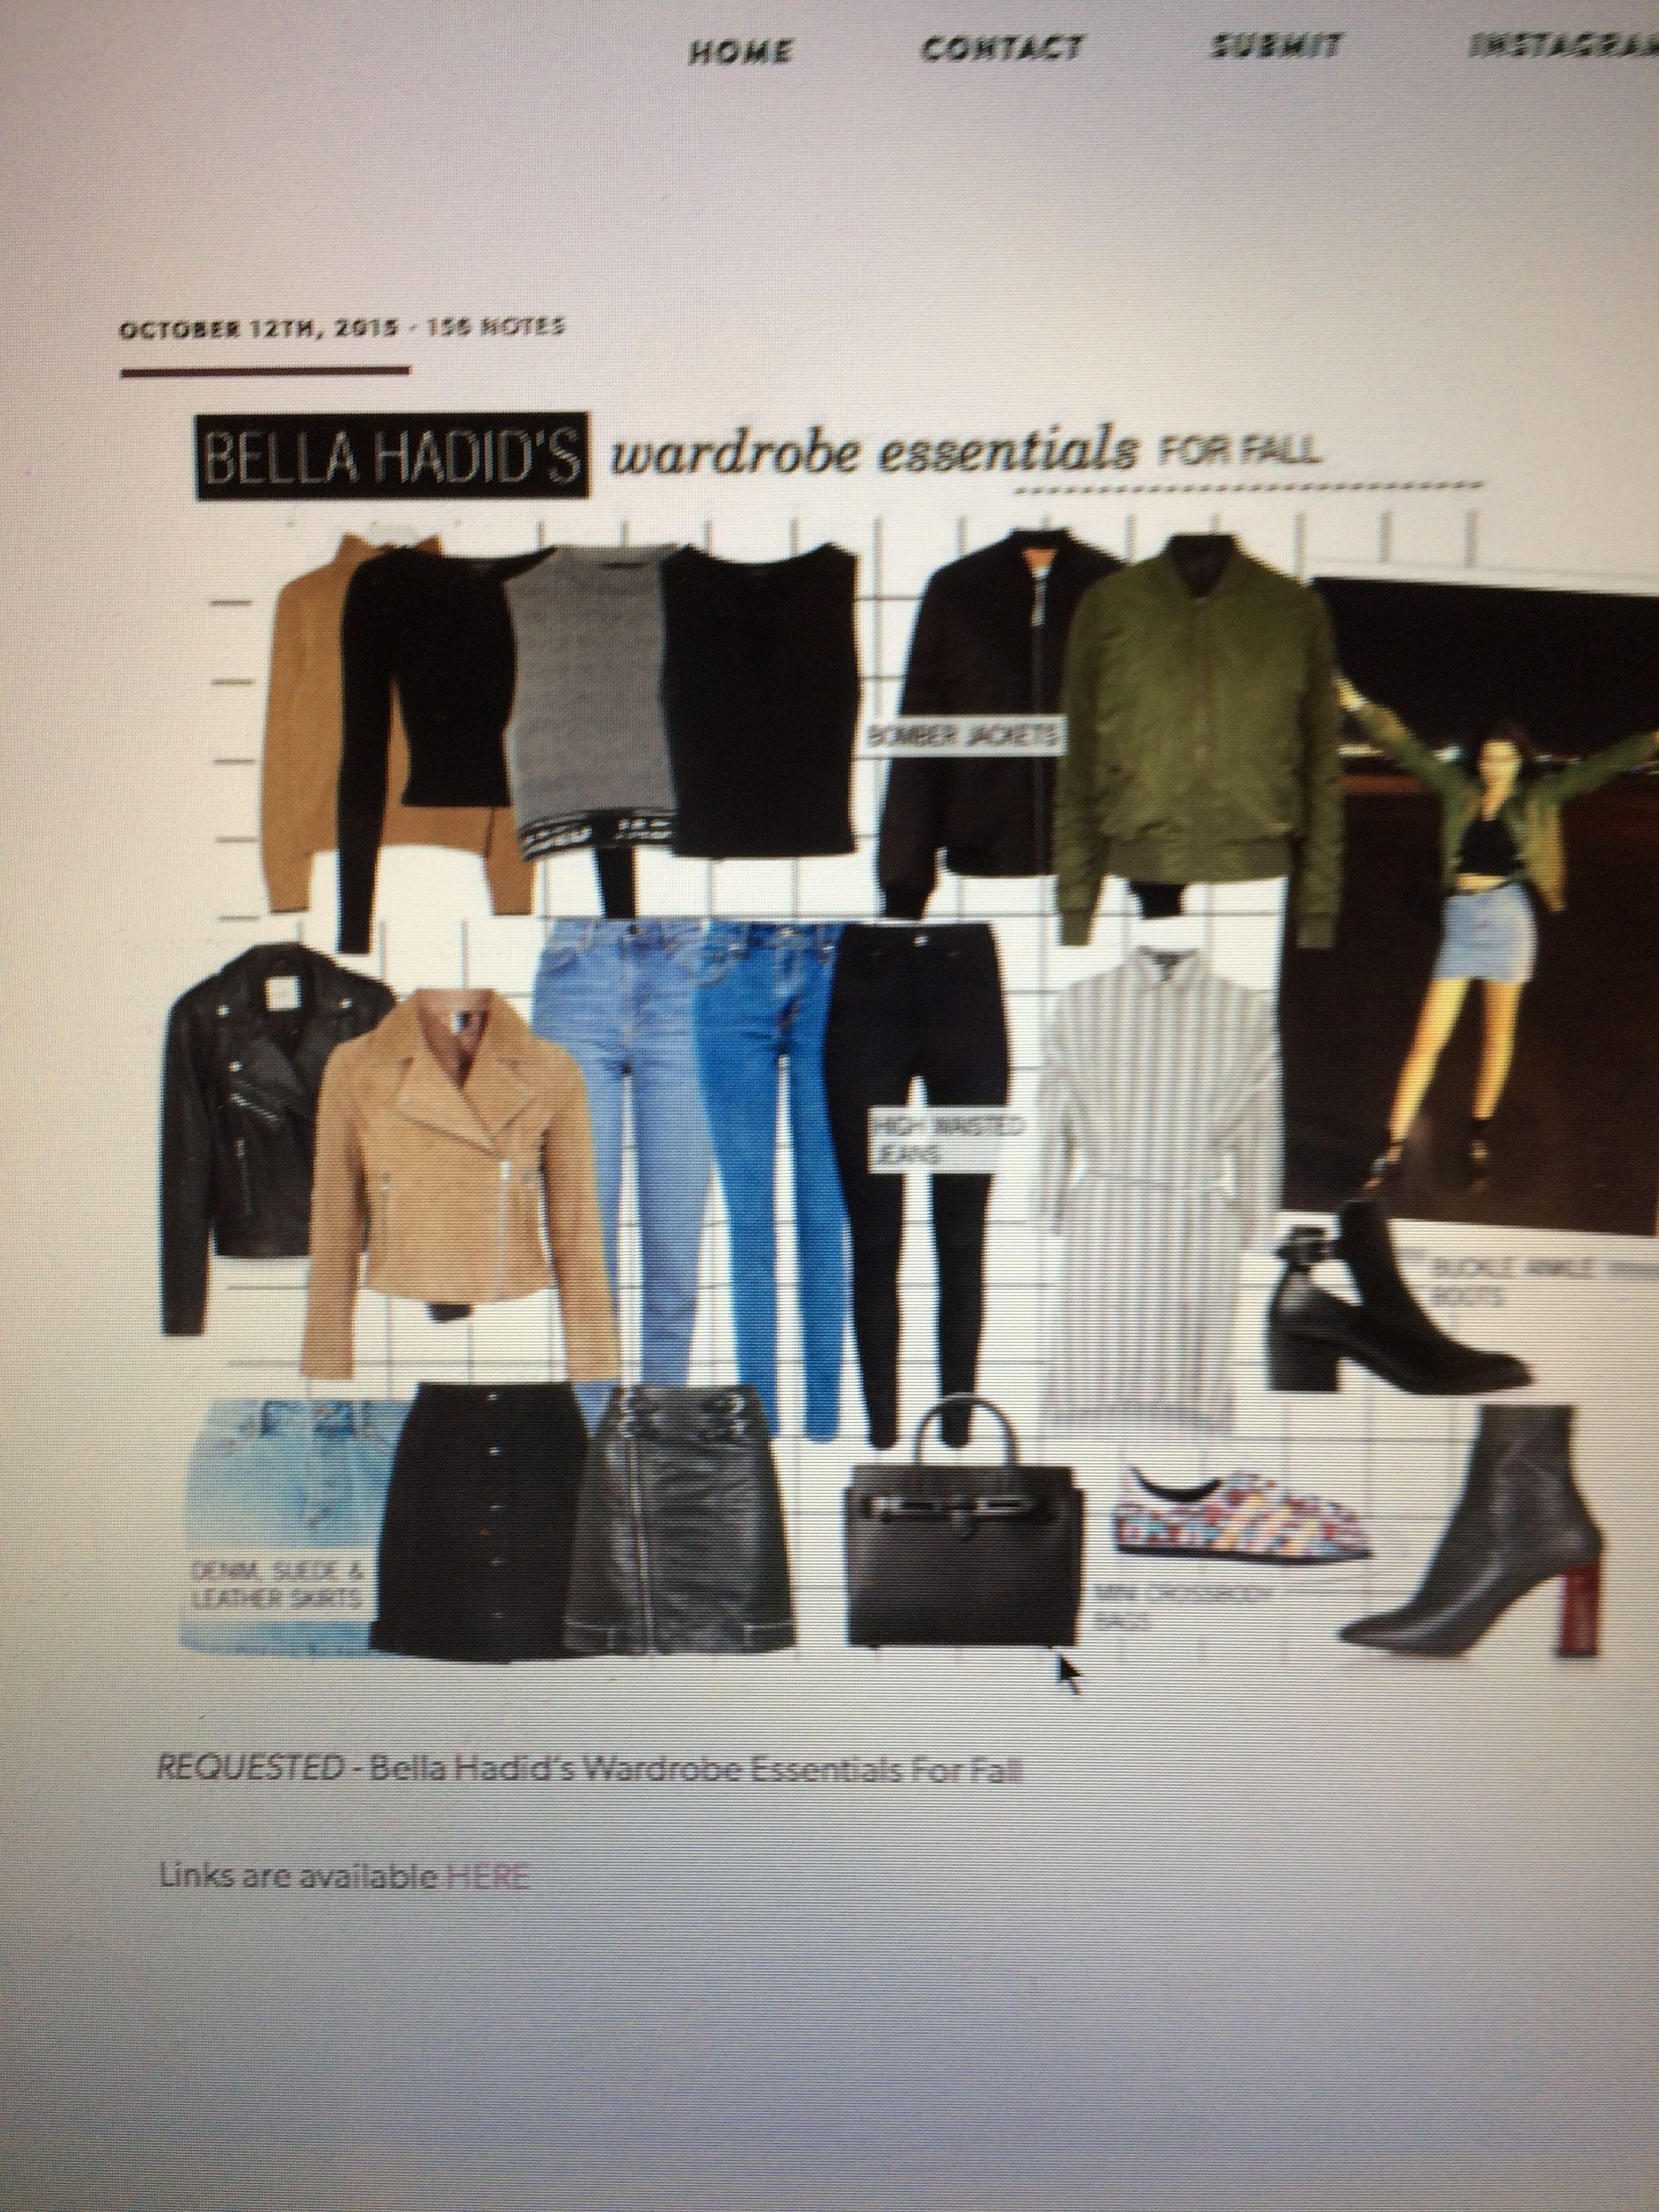 Bella Hadid's Wardrobe Essentials